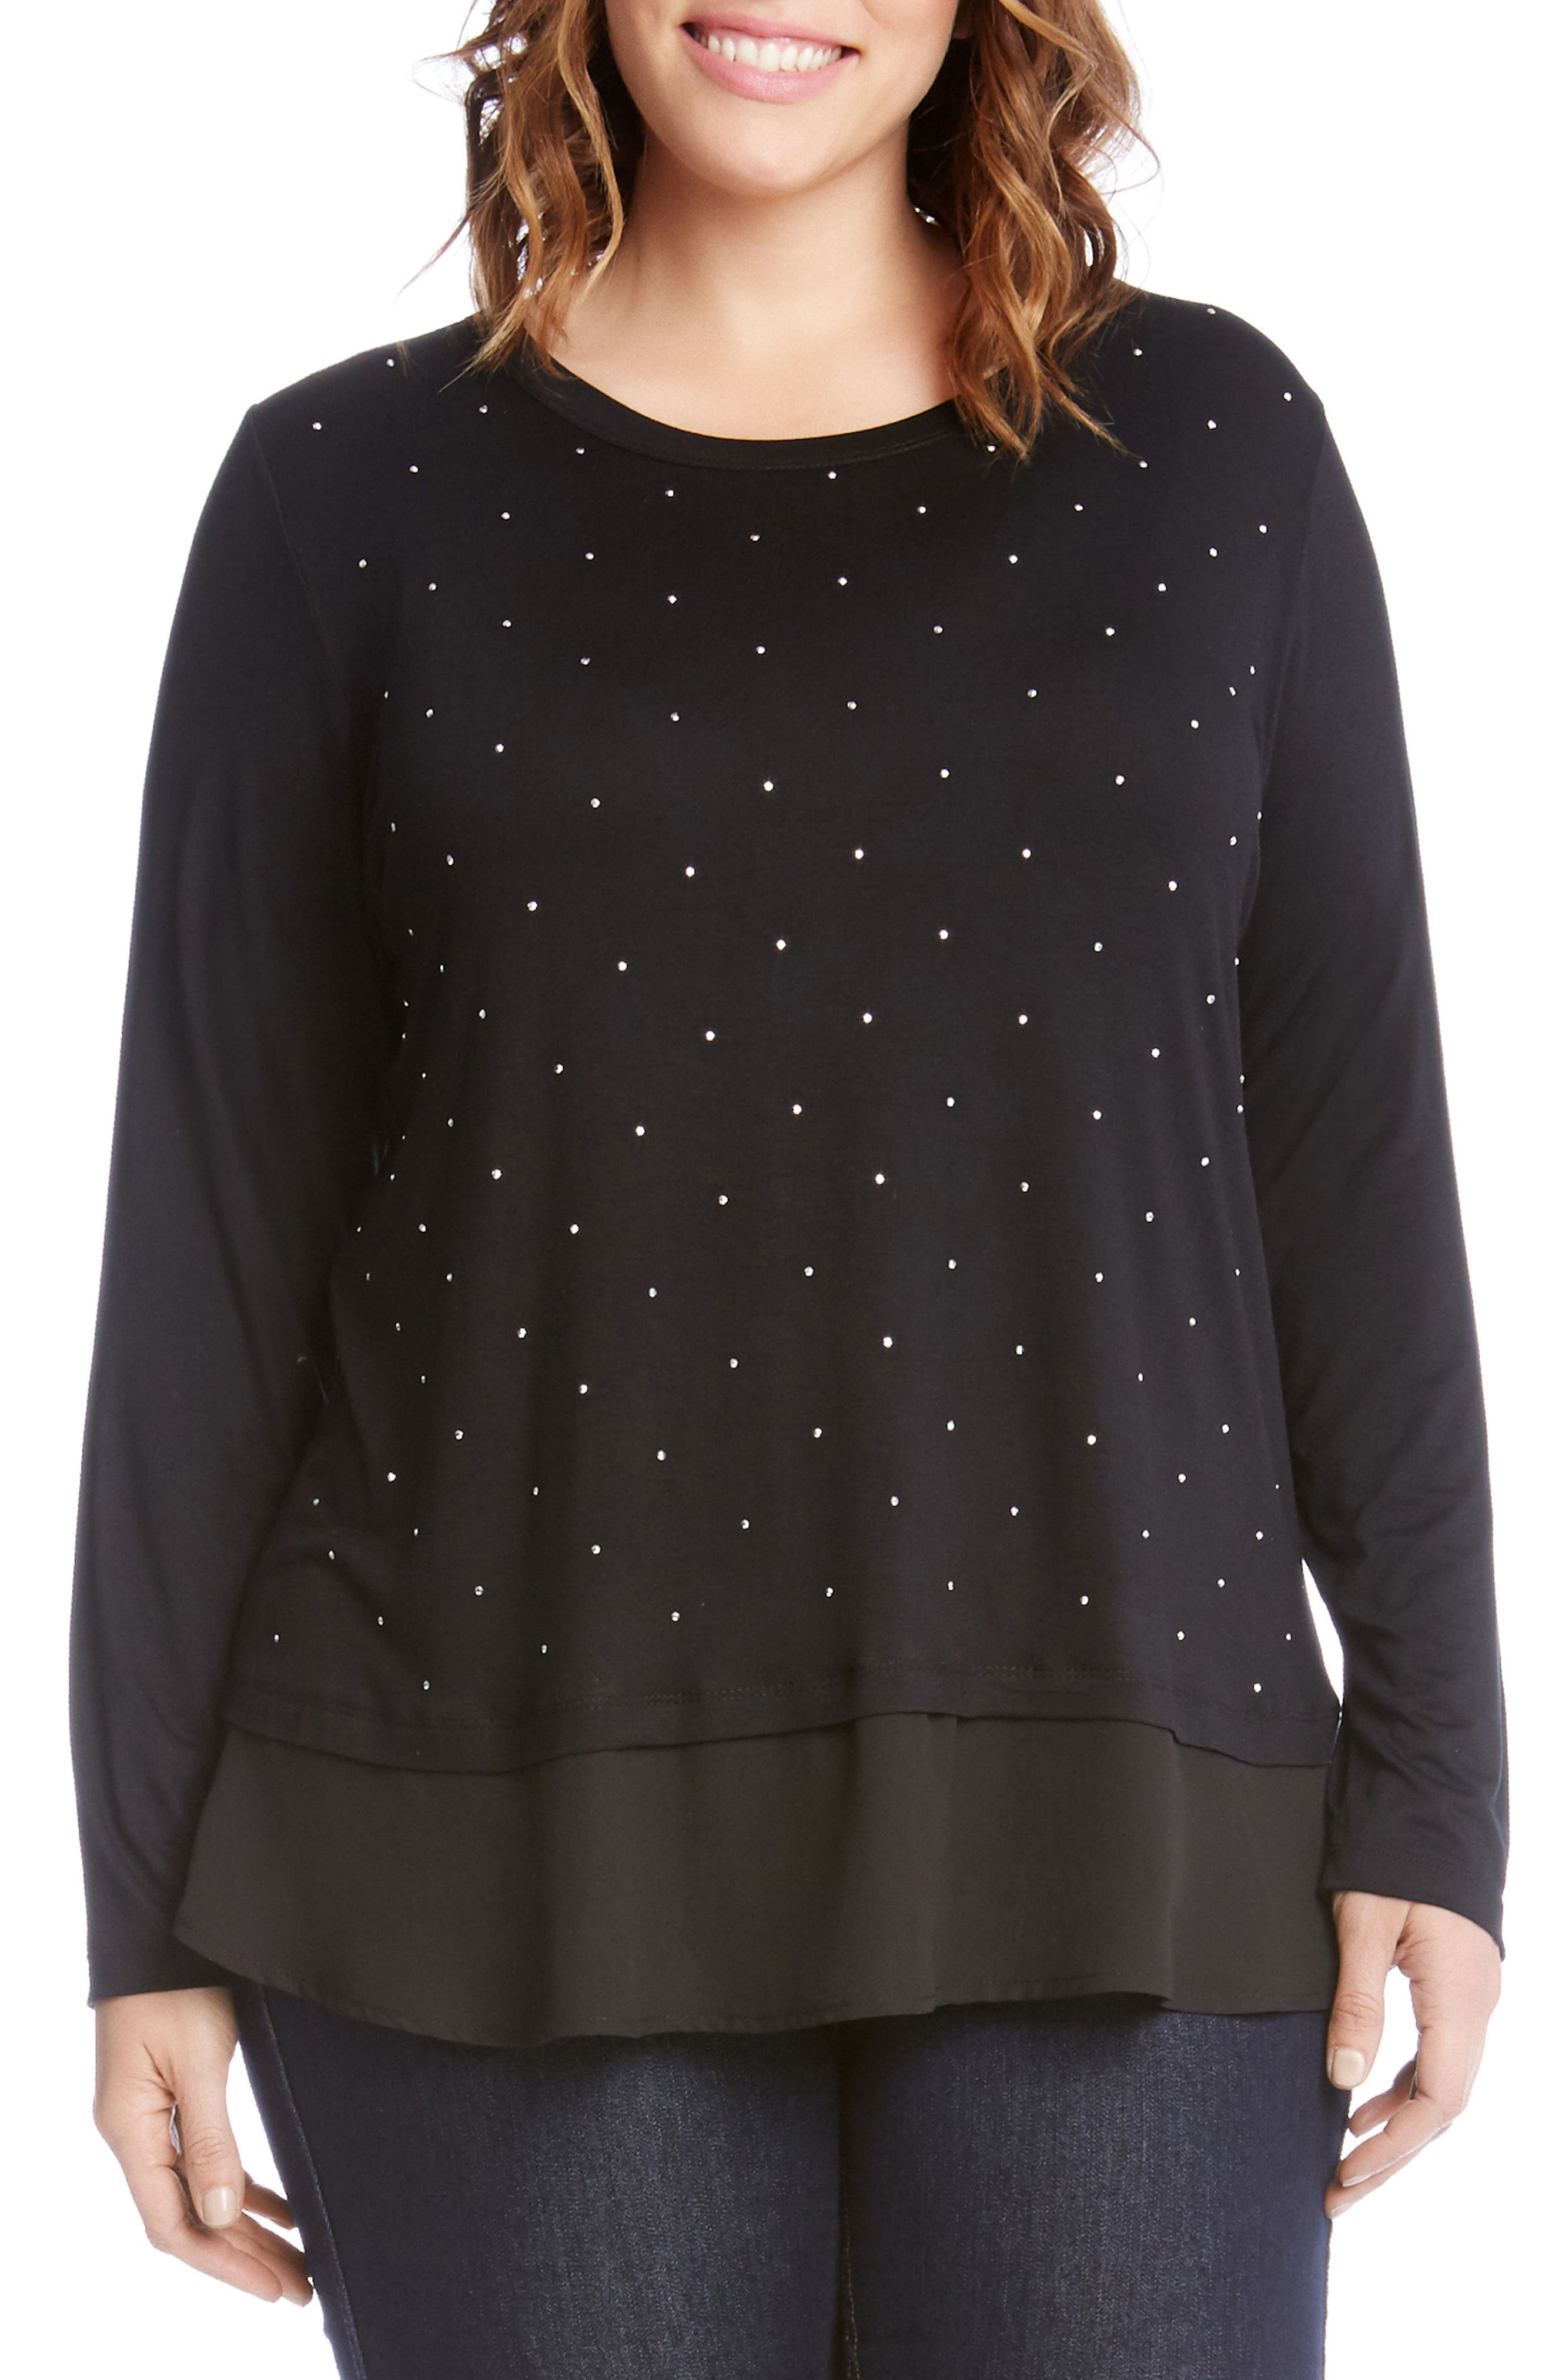 Alternate Image 1 Selected - Karen Kane Studded Woven Hem Top (Plus Size)